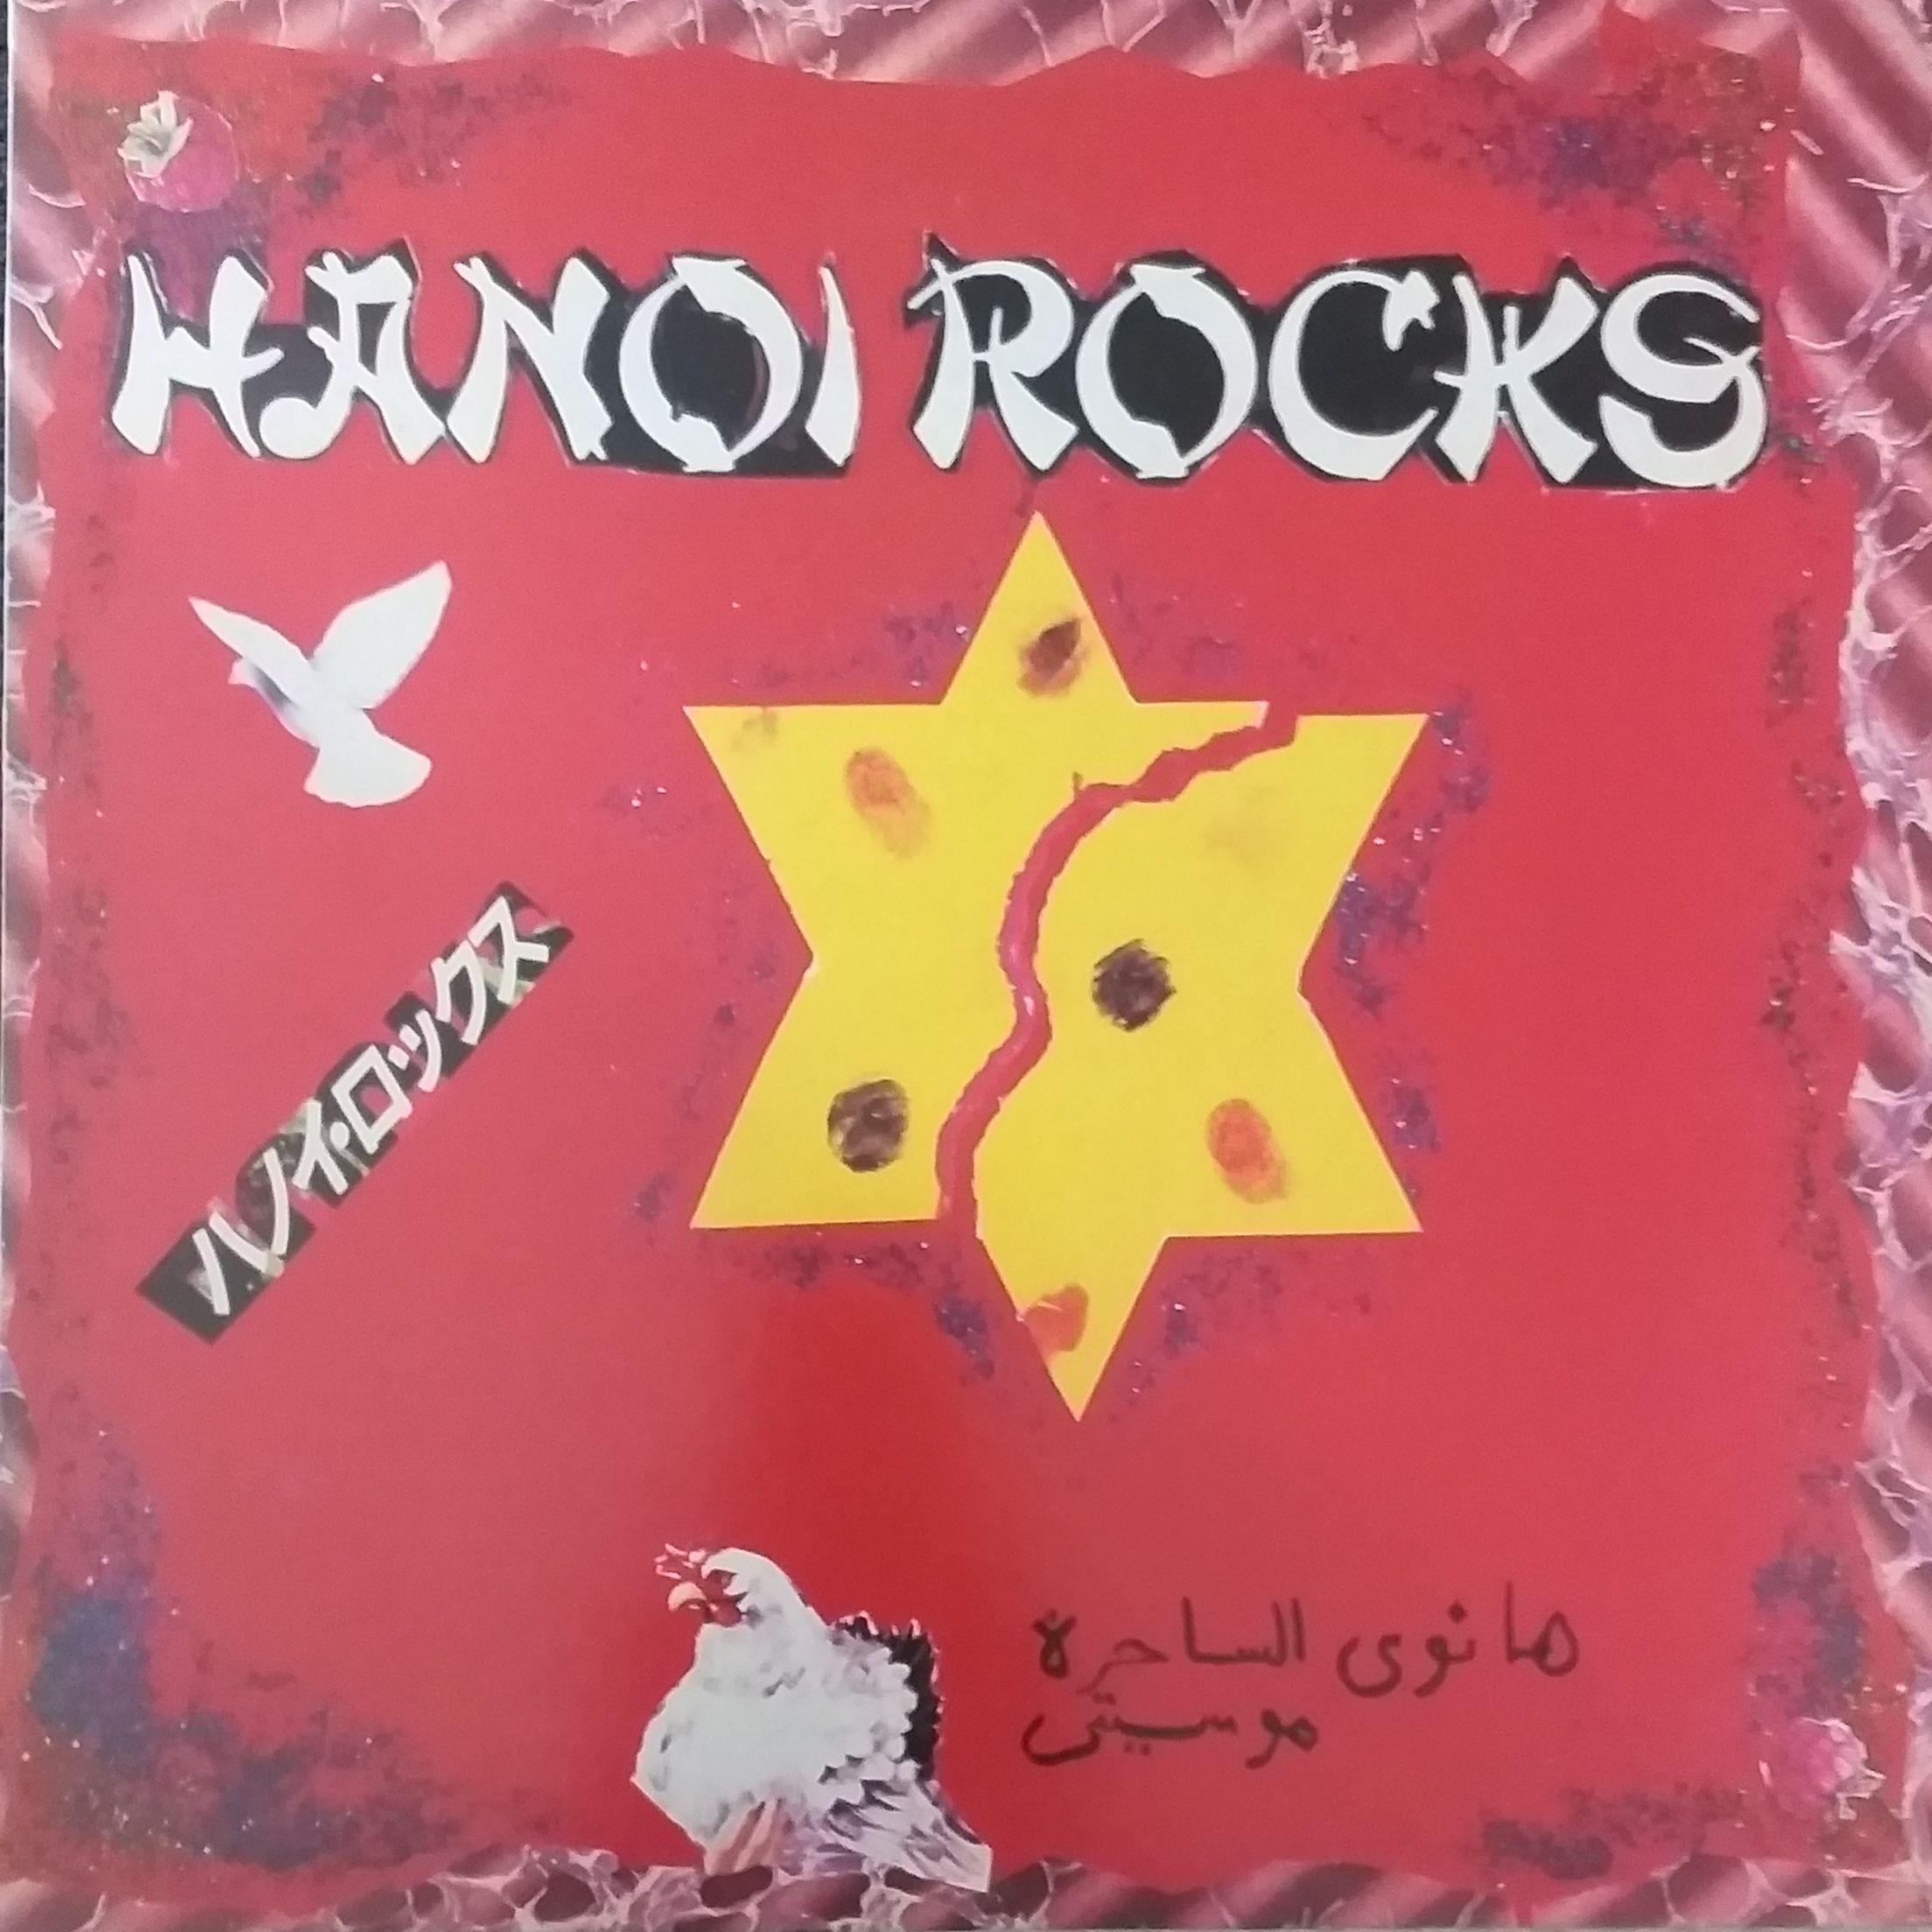 Hanoi rocks Rock n' roll divorce LP undefined